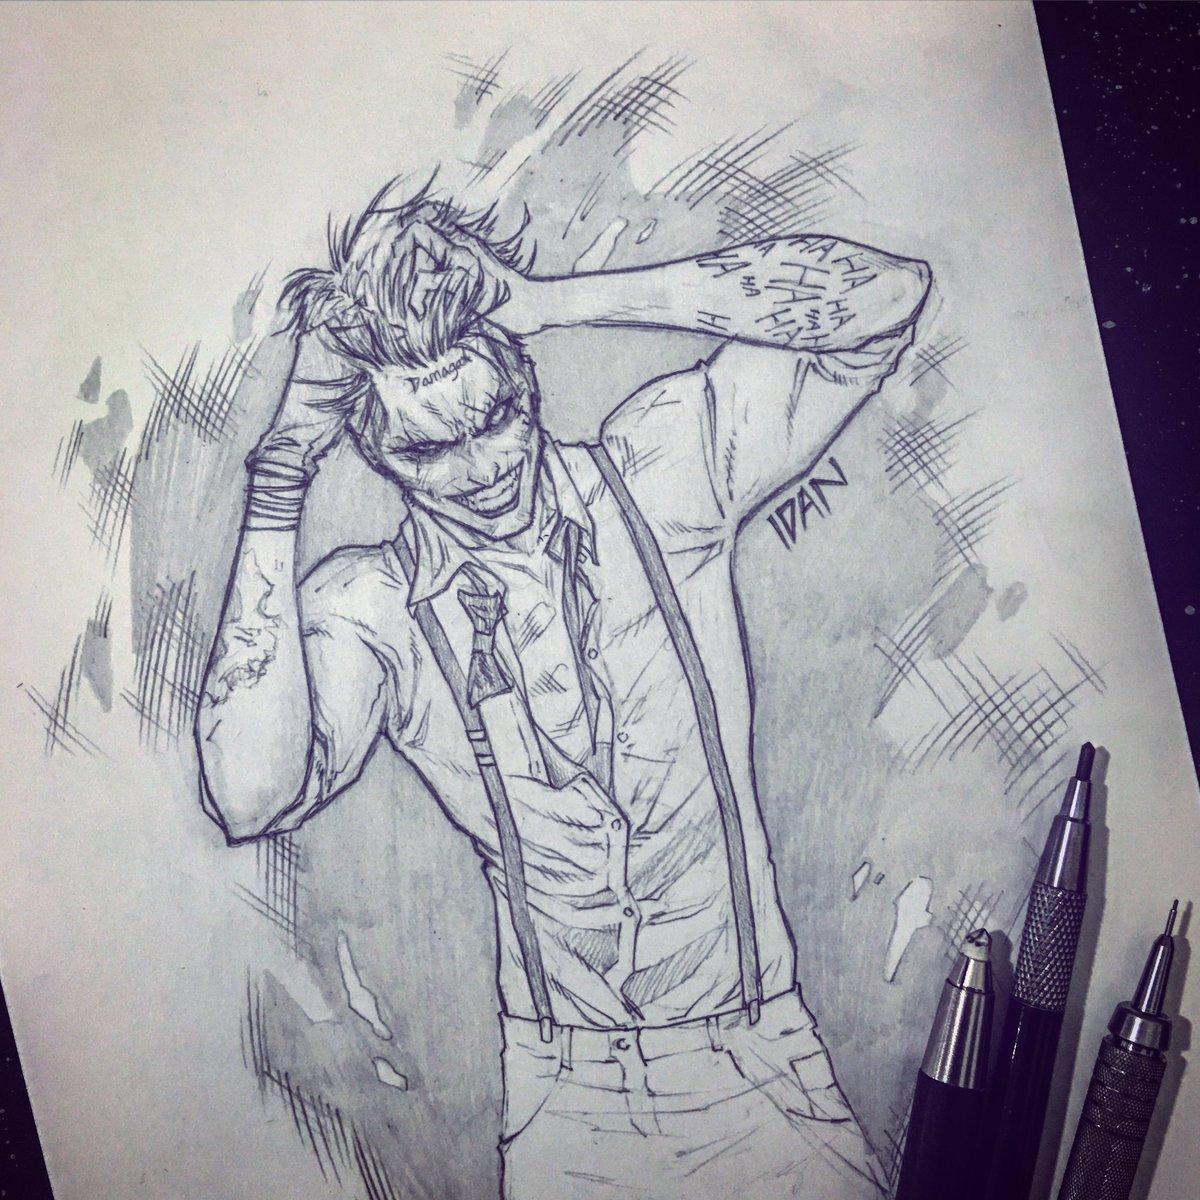 Pencil sketch artwork joker batman dccomics artofidanpic twitter com npc4rzyydx